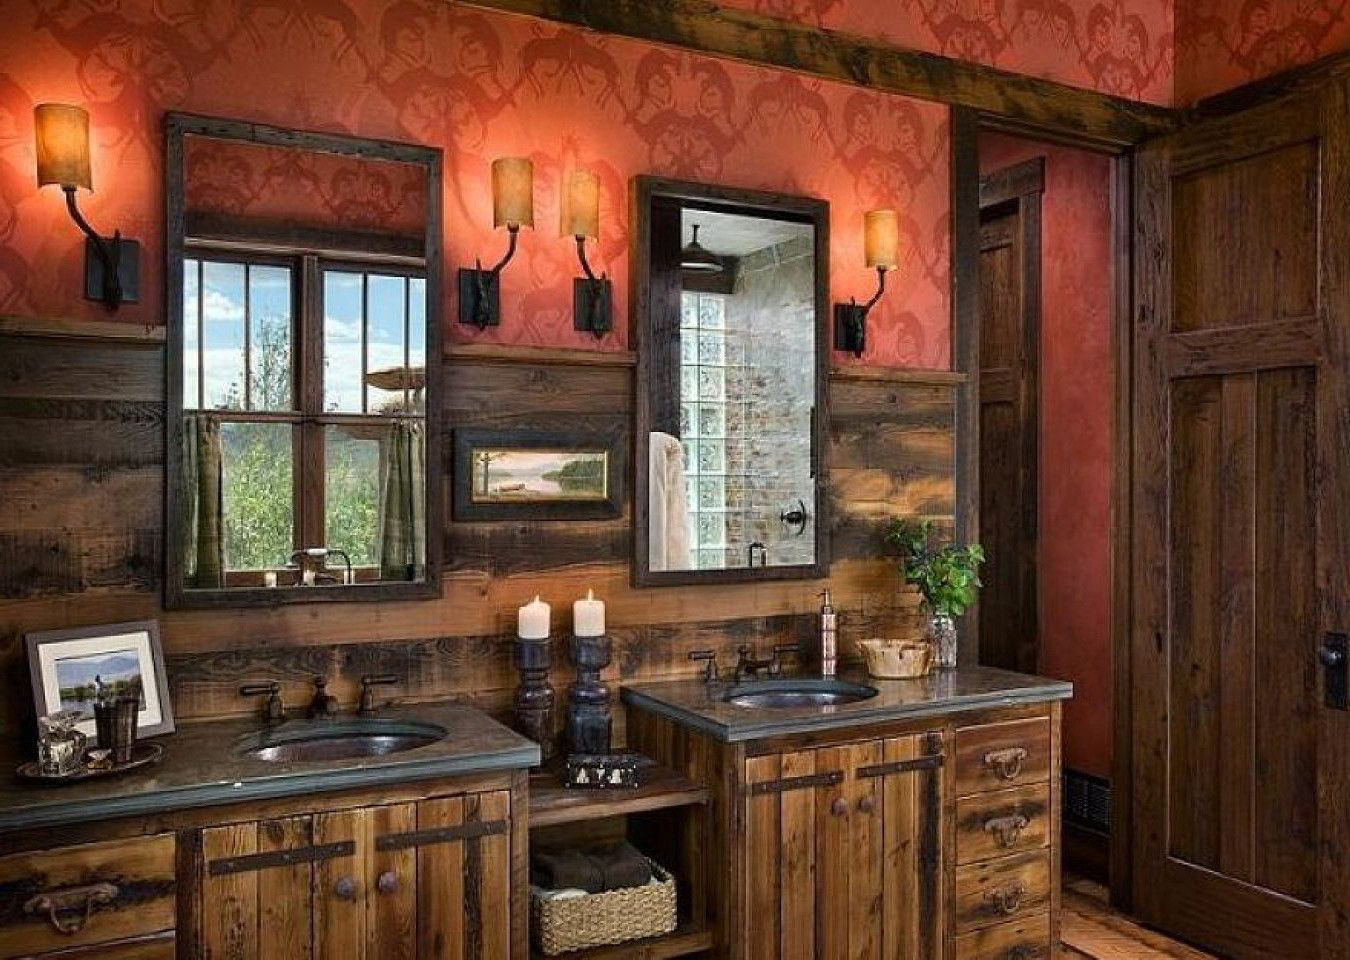 Western shower enclosures unique rustic bathrooms unique rustic